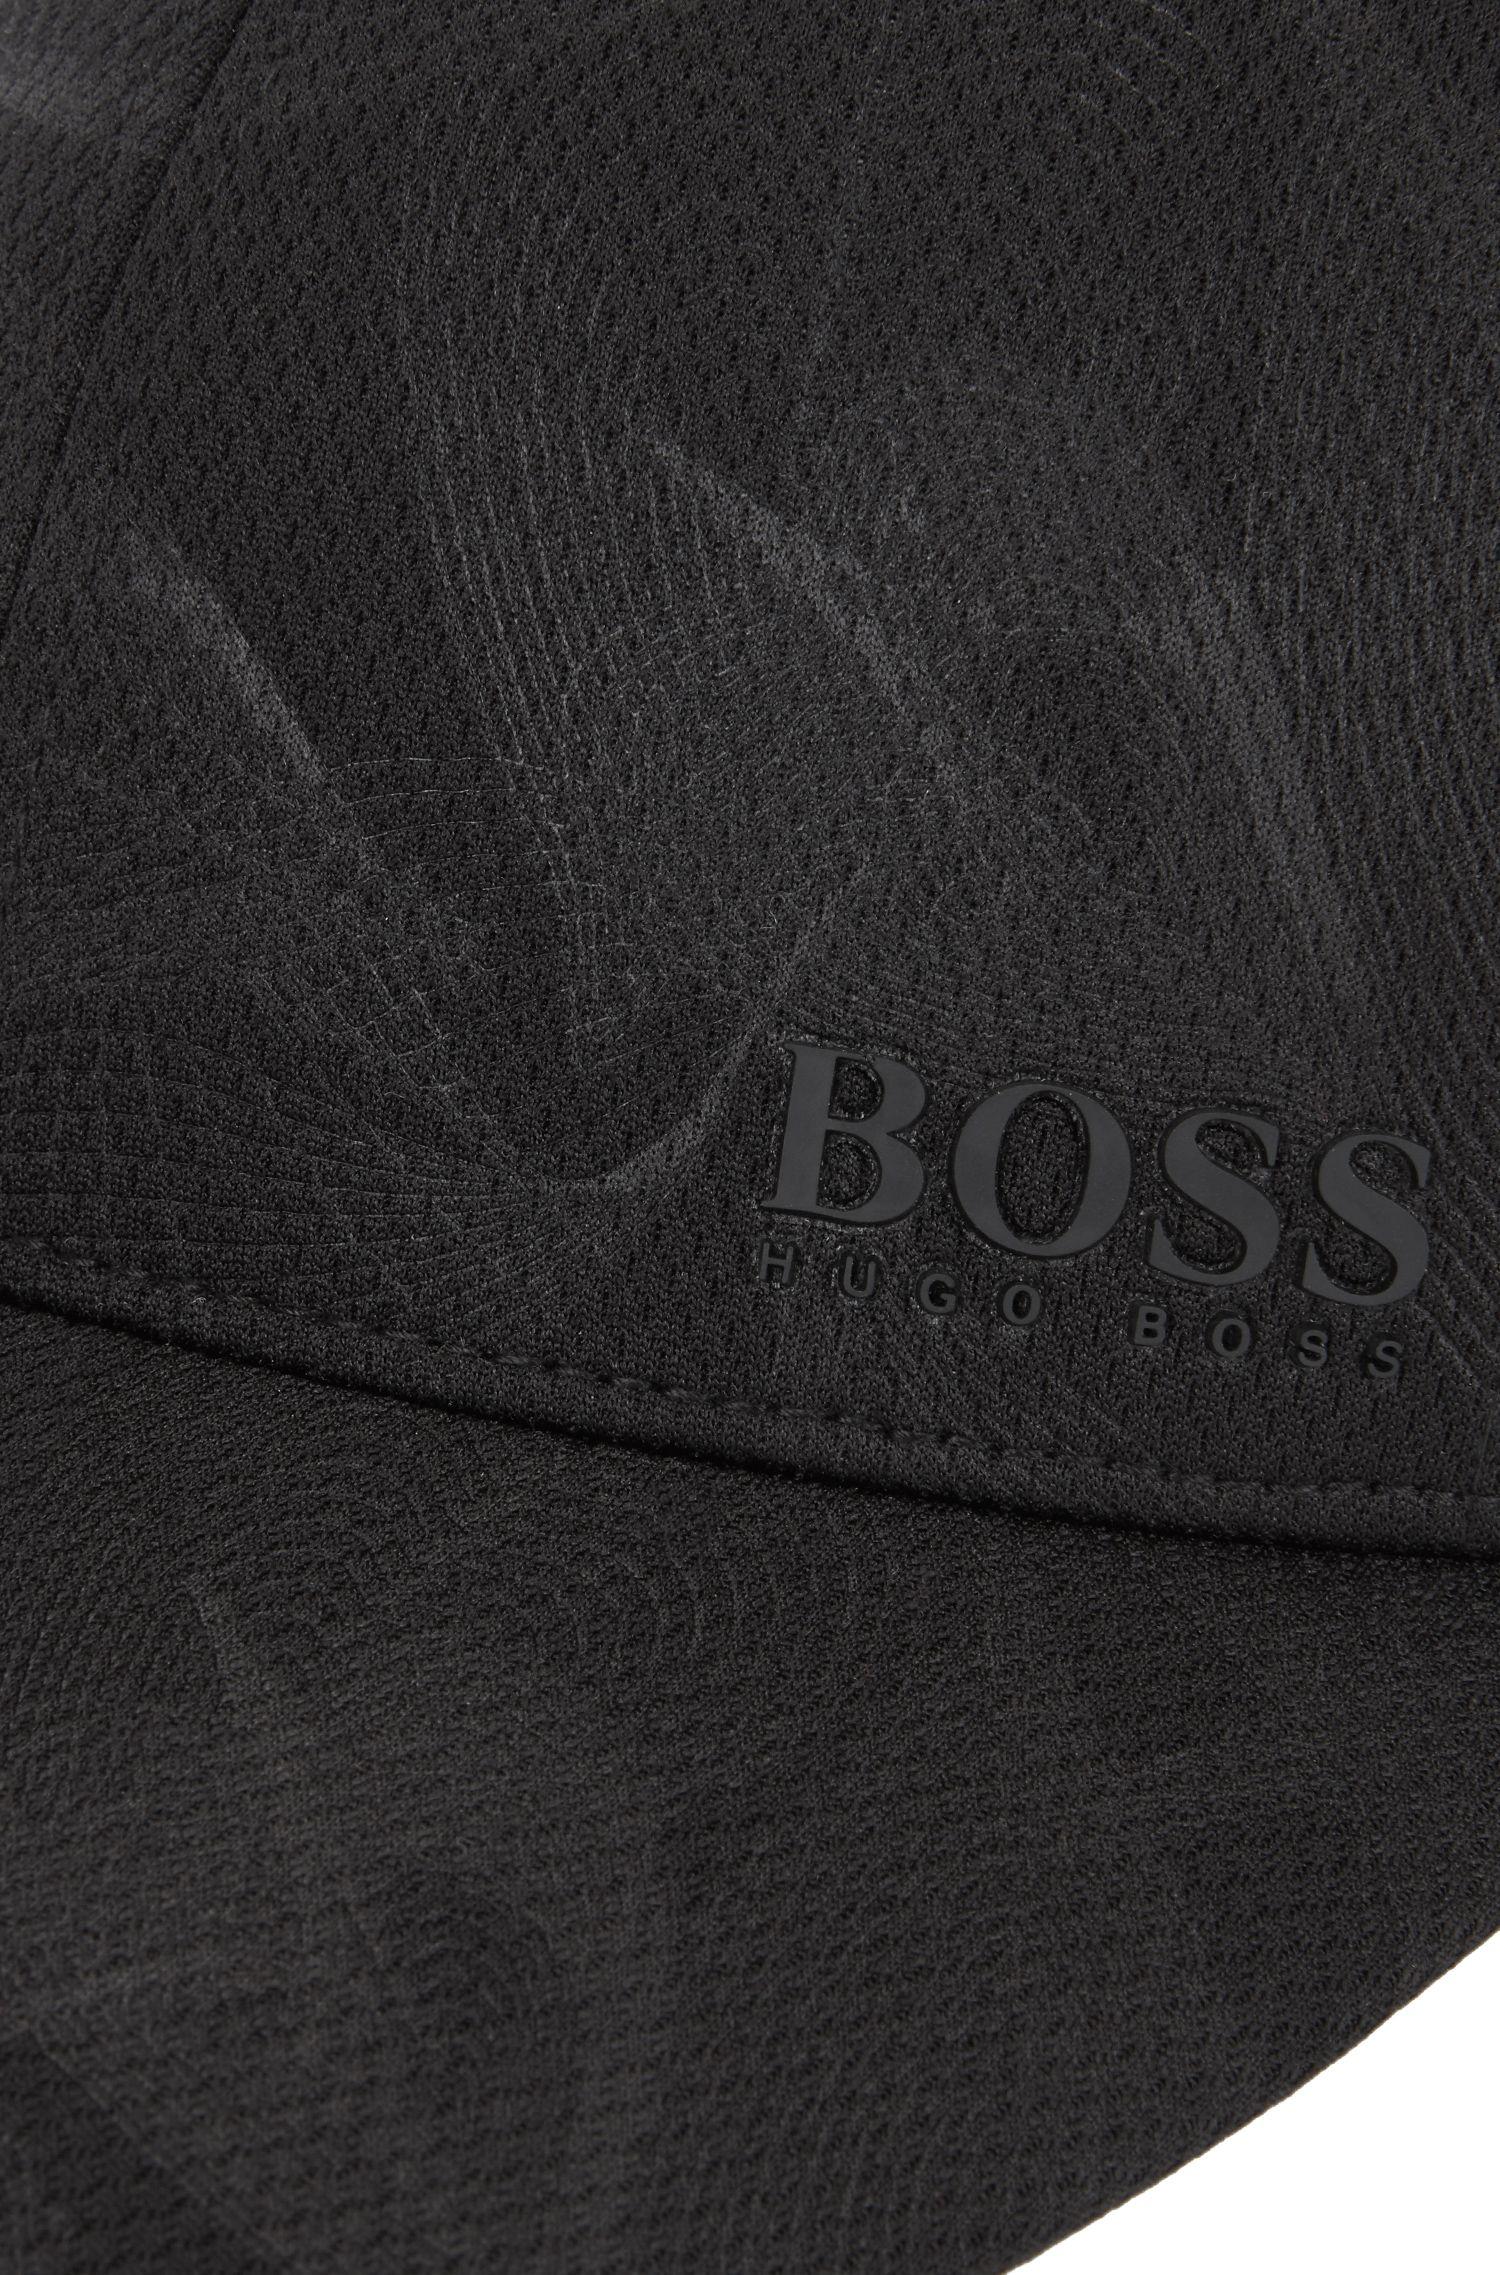 Printed Jersey Cap | Printcap, Black